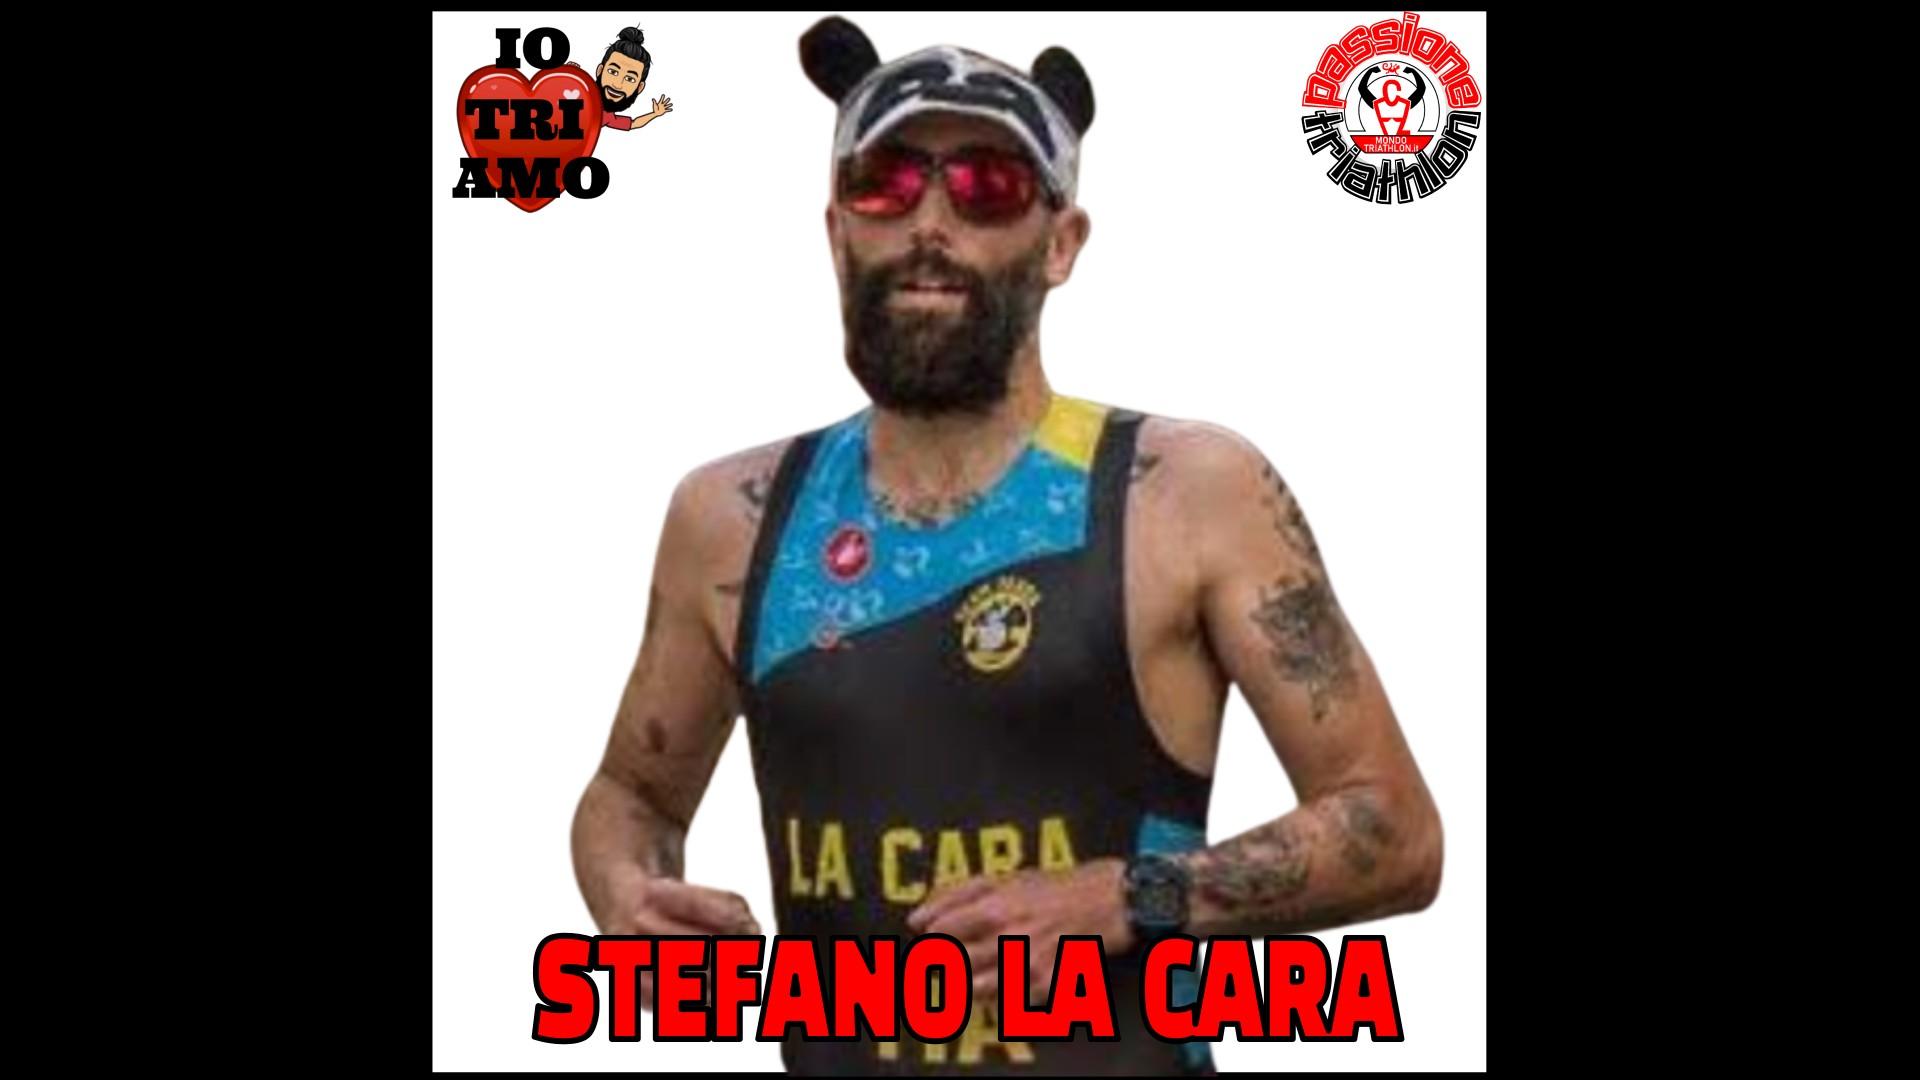 Stefano La Cara Passione Triathlon n° 93